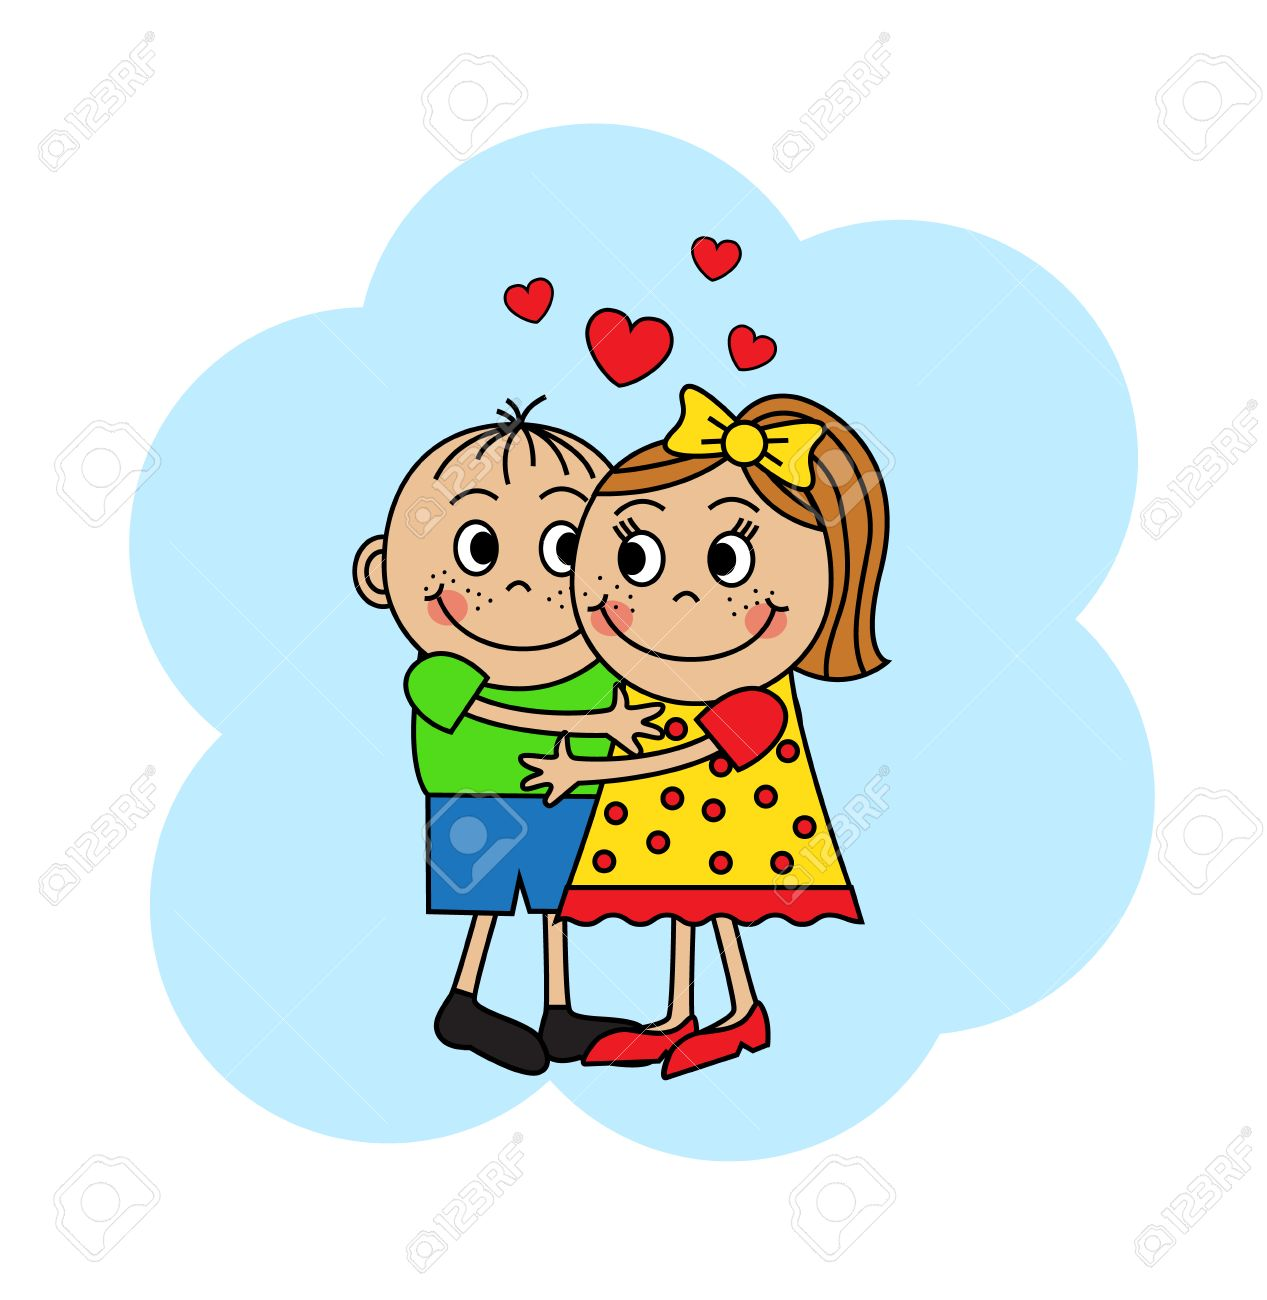 Cartoon couple in love, boy and girl hugging.